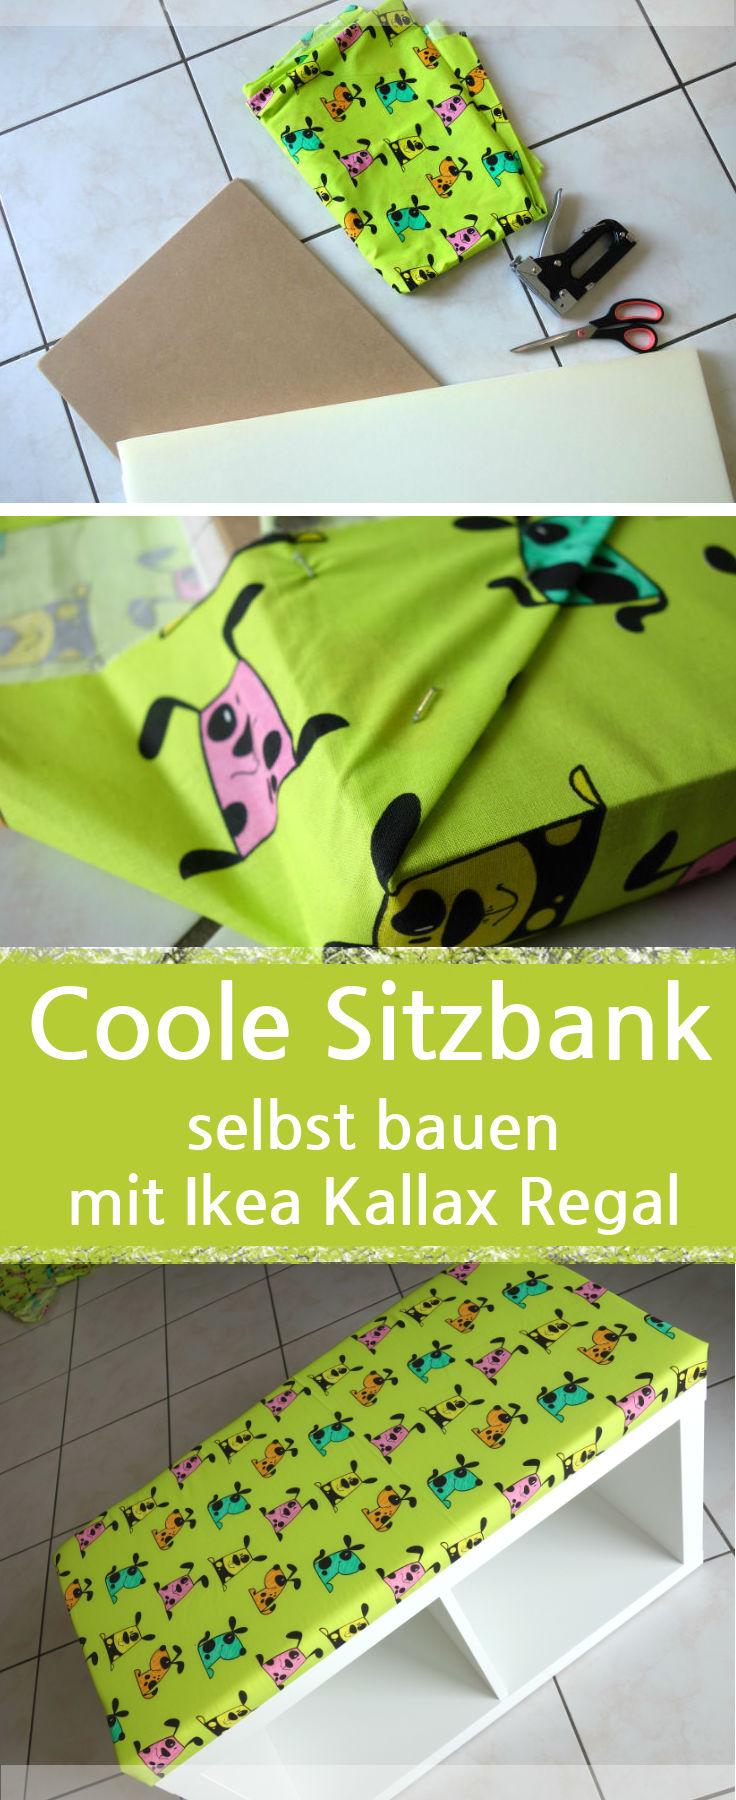 sitzbank-selbst-bauen-gl